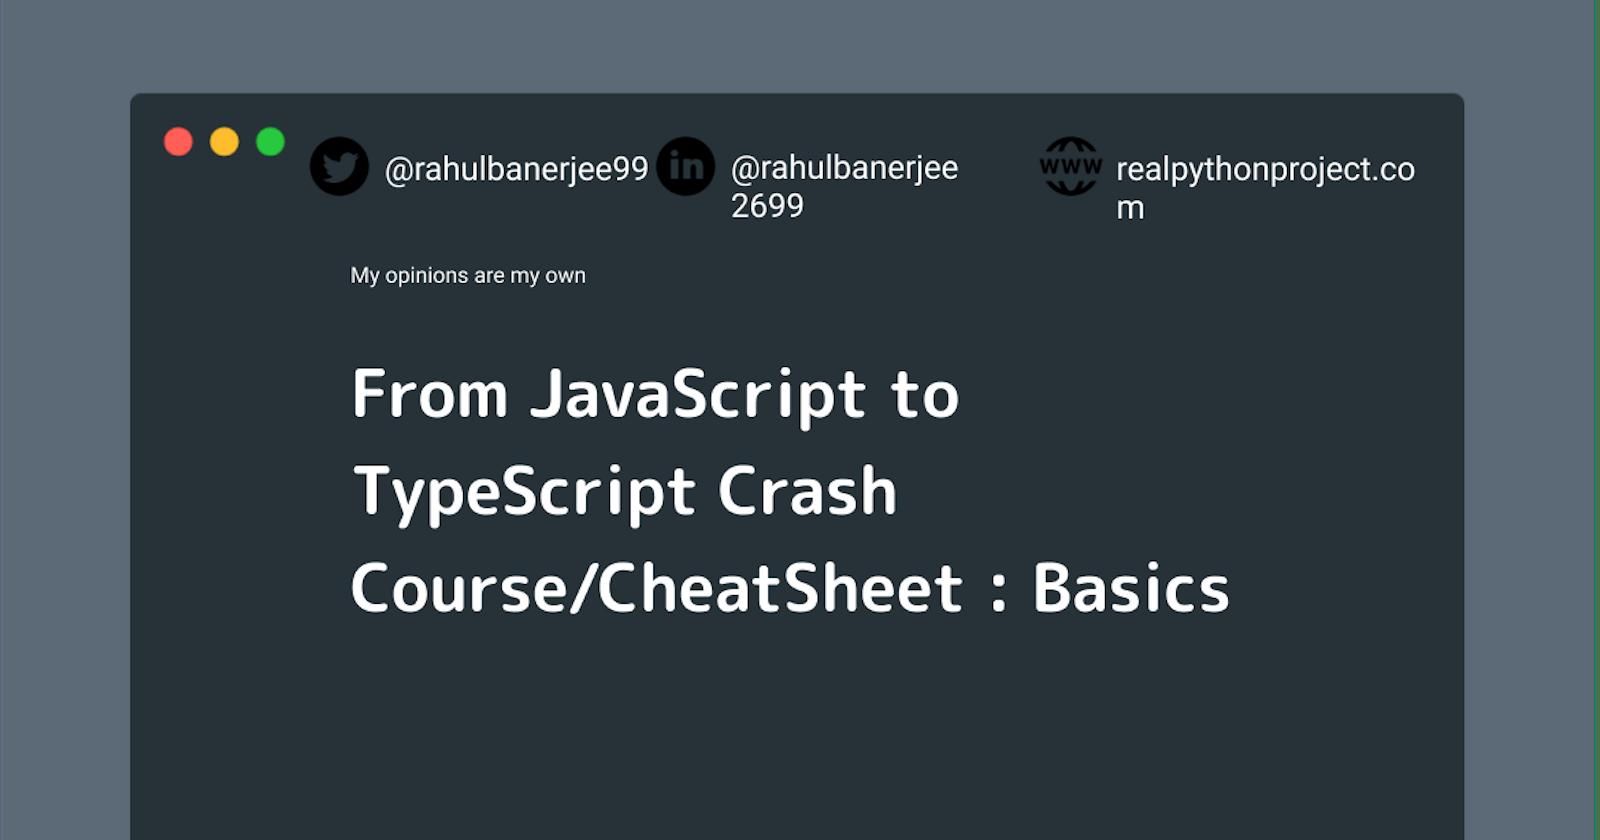 From JavaScript to TypeScript Crash Course/CheatSheet : Basics